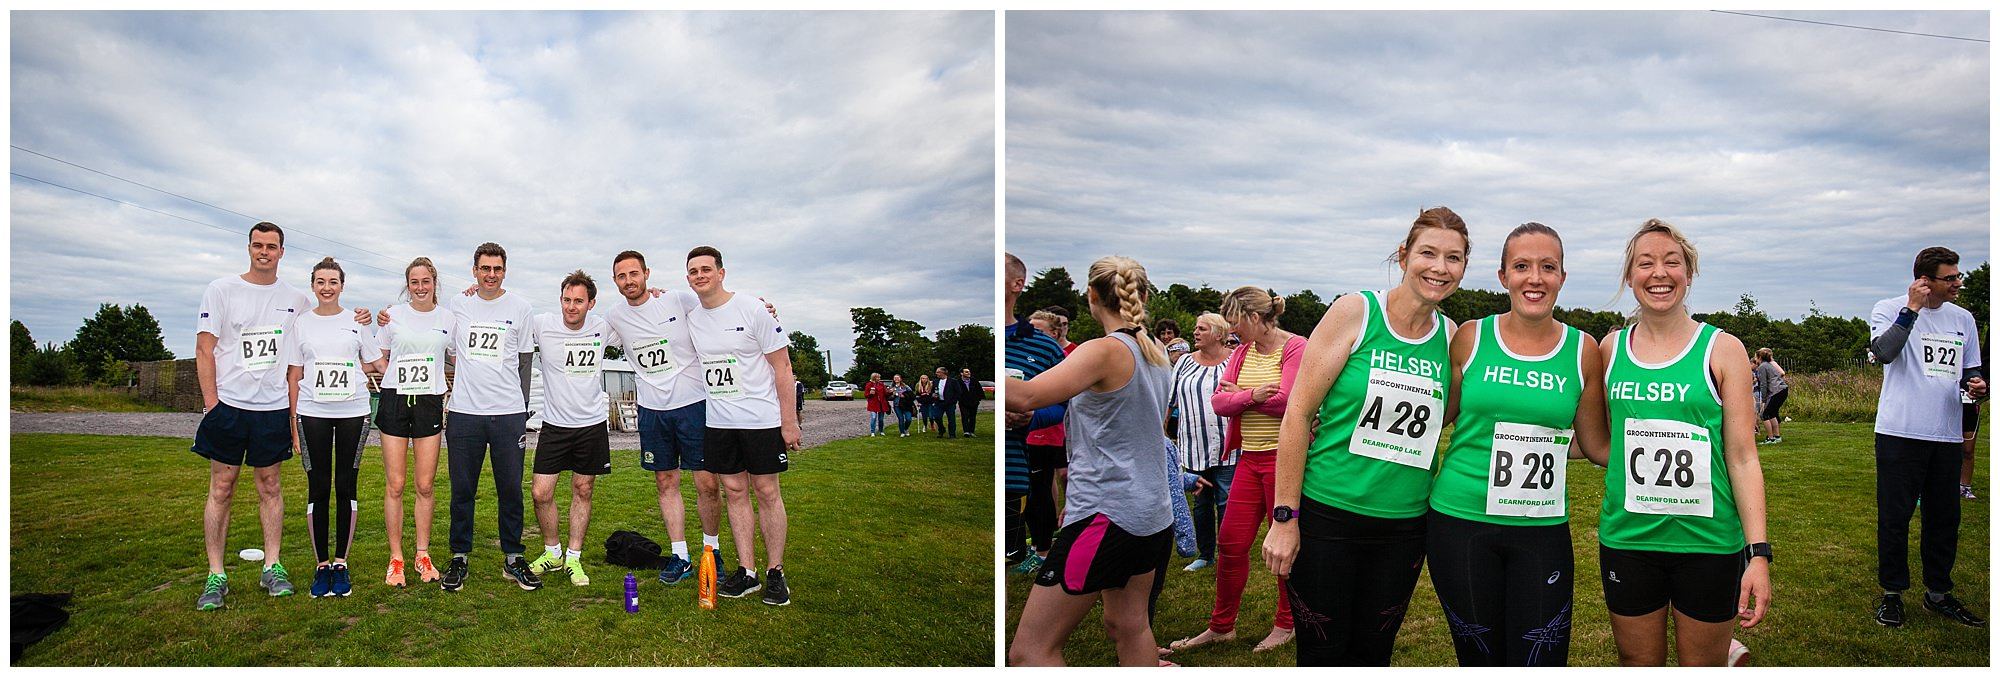 additional team photos near the adlerford lake start line - shropshire event photographer